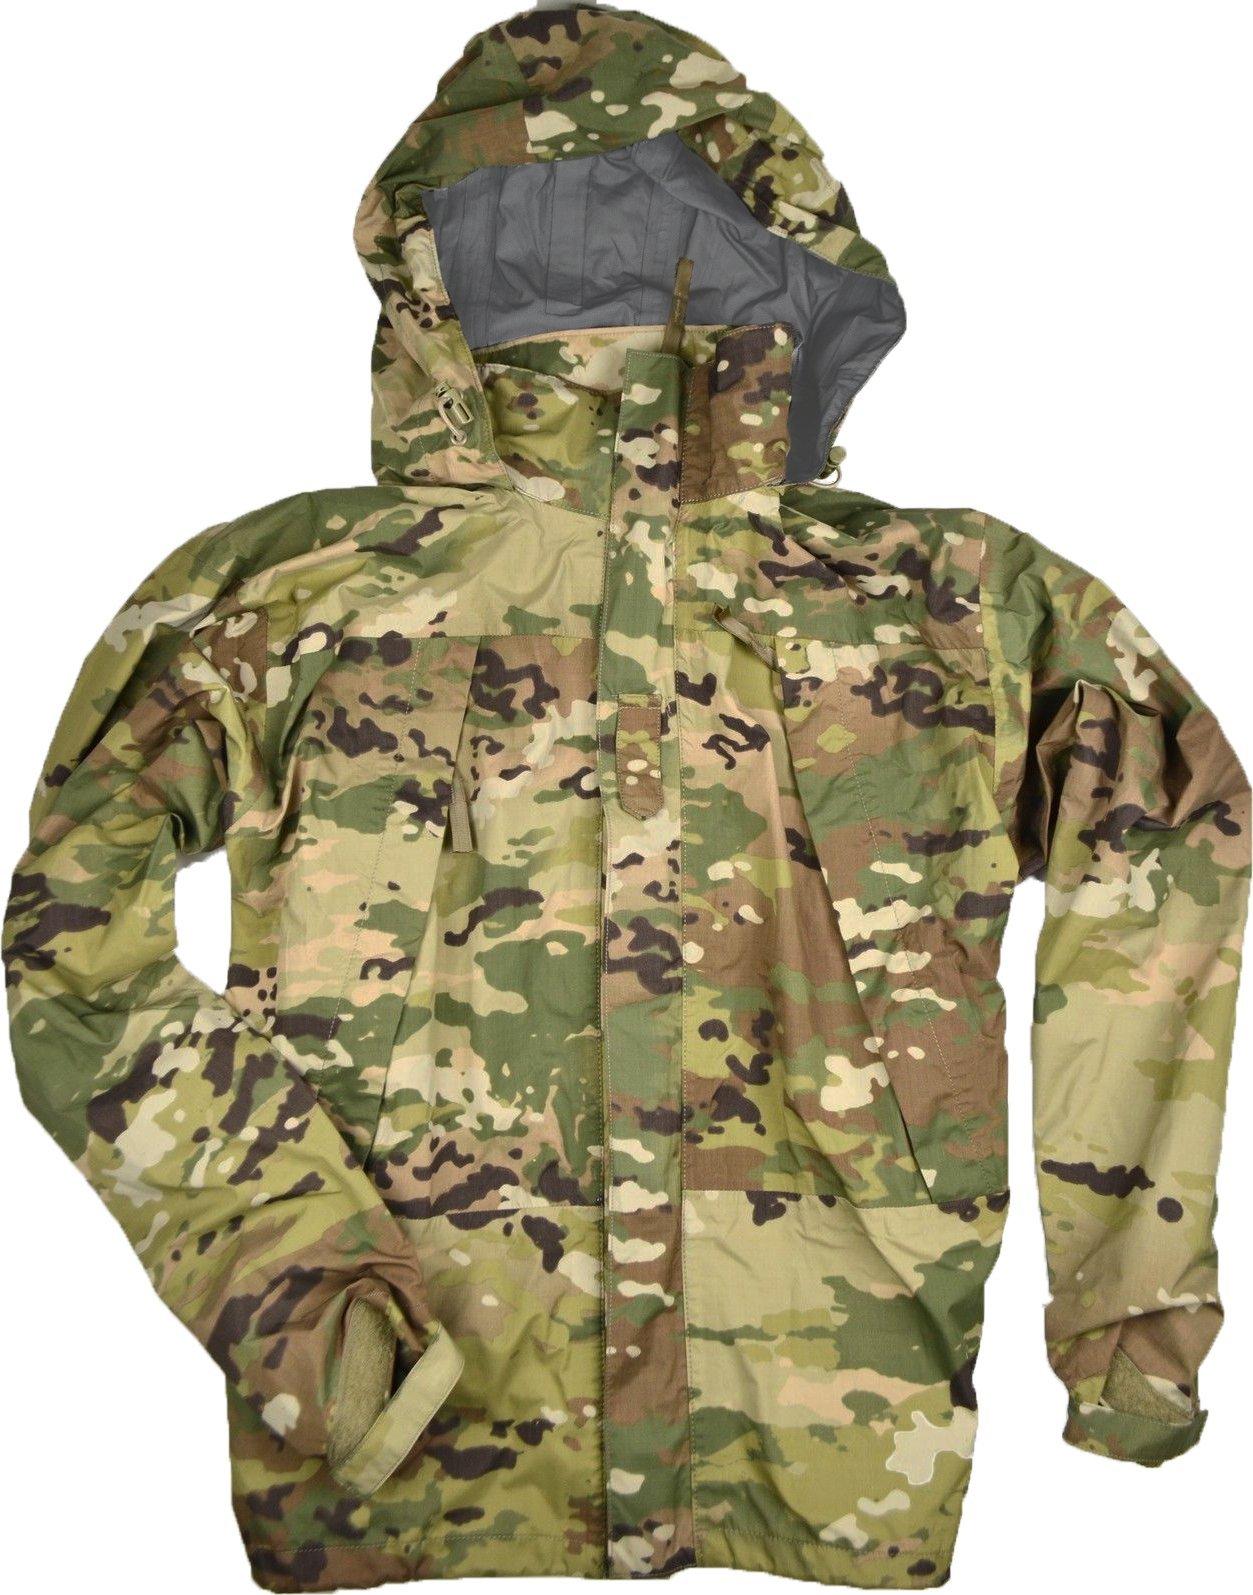 Genuine Military Extreme Cold Weather Level 6 Rain Parka, Scorpion (OCP), Made In USA, Size XXLXL